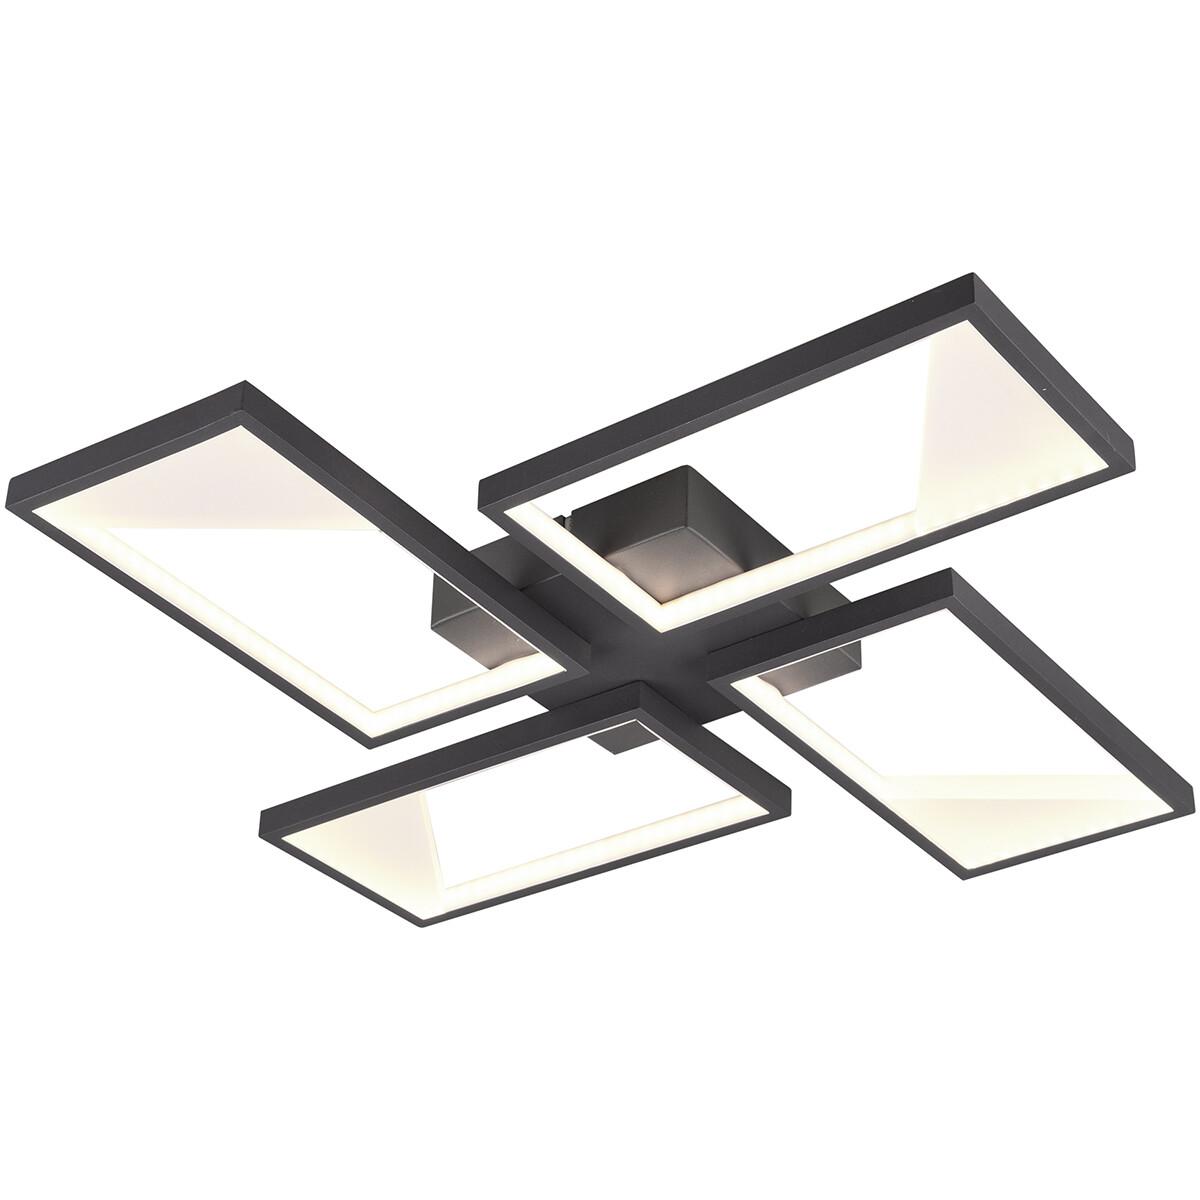 LED Plafondlamp - Plafondverlichting - Trion Civa - 28W - Warm Wit 3000K - Dimbaar - Vierkant - Mat